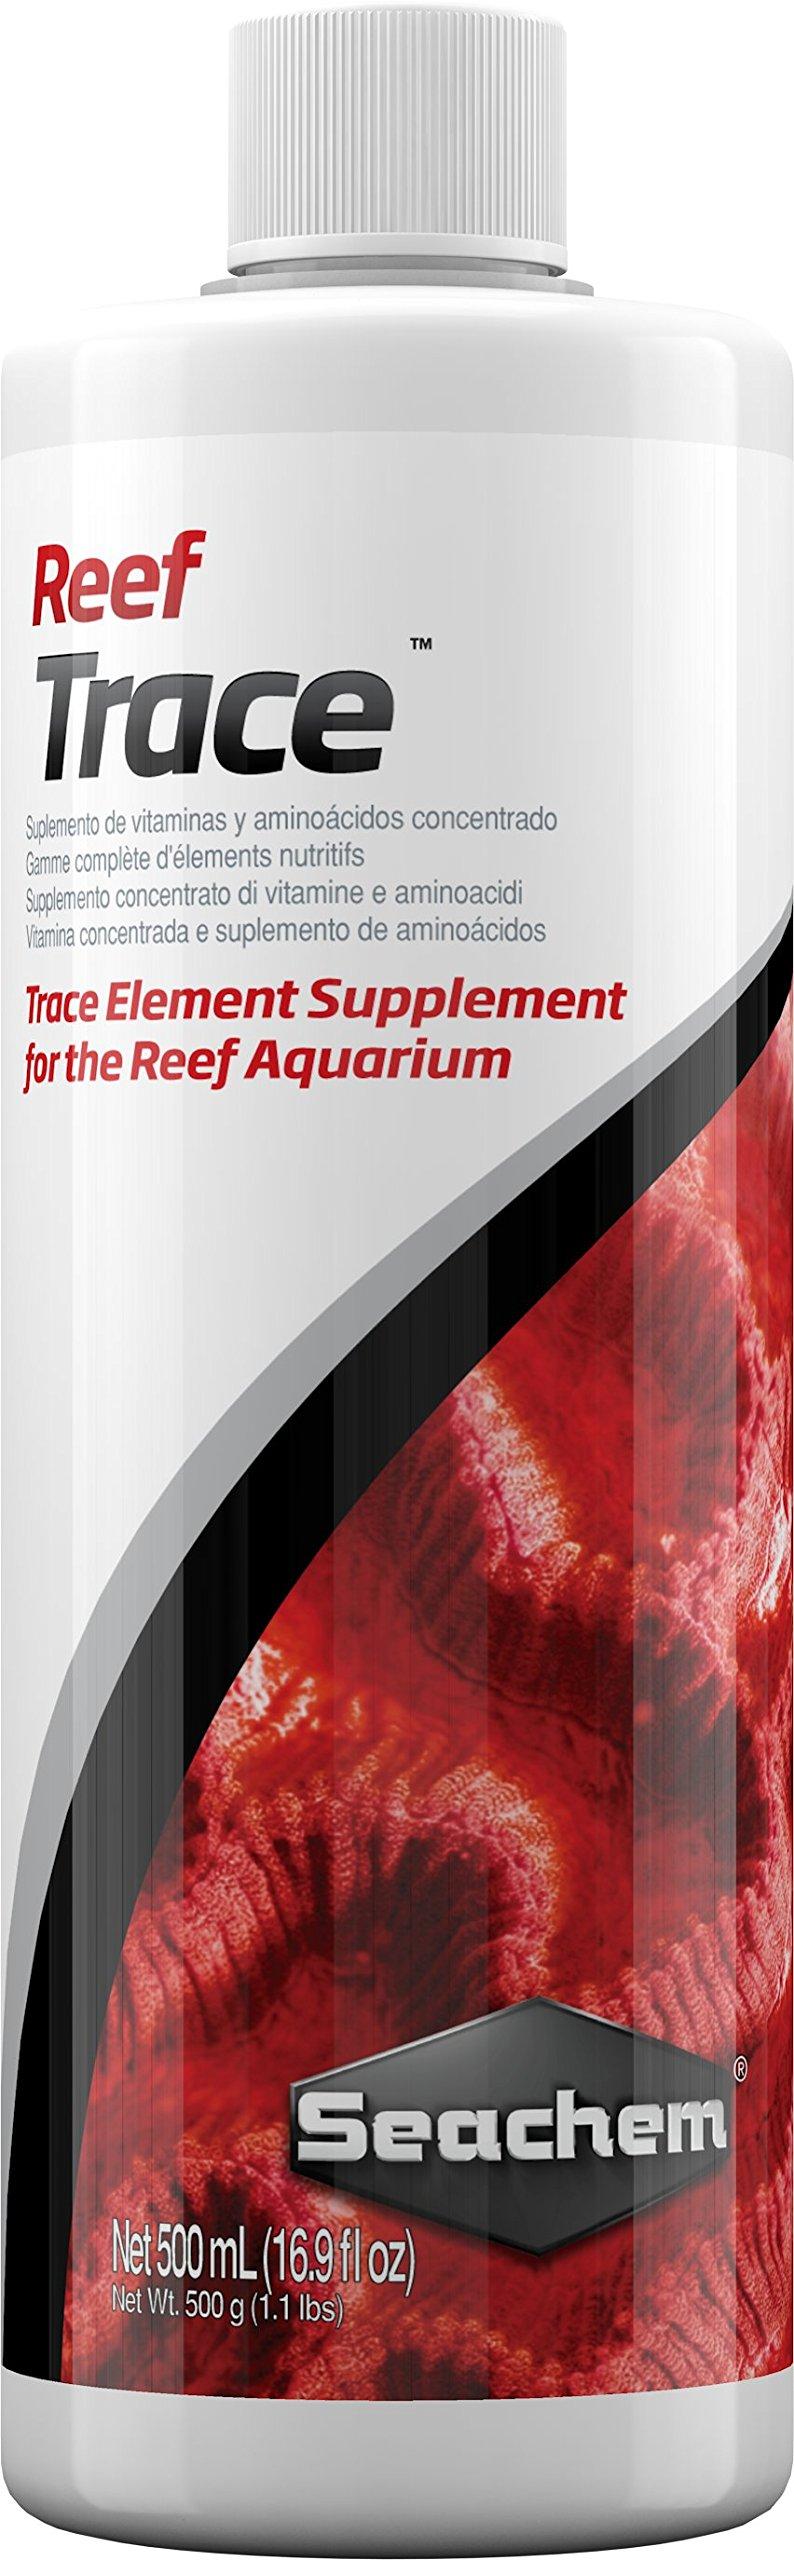 Seachem Reef Trace Elements 500ml